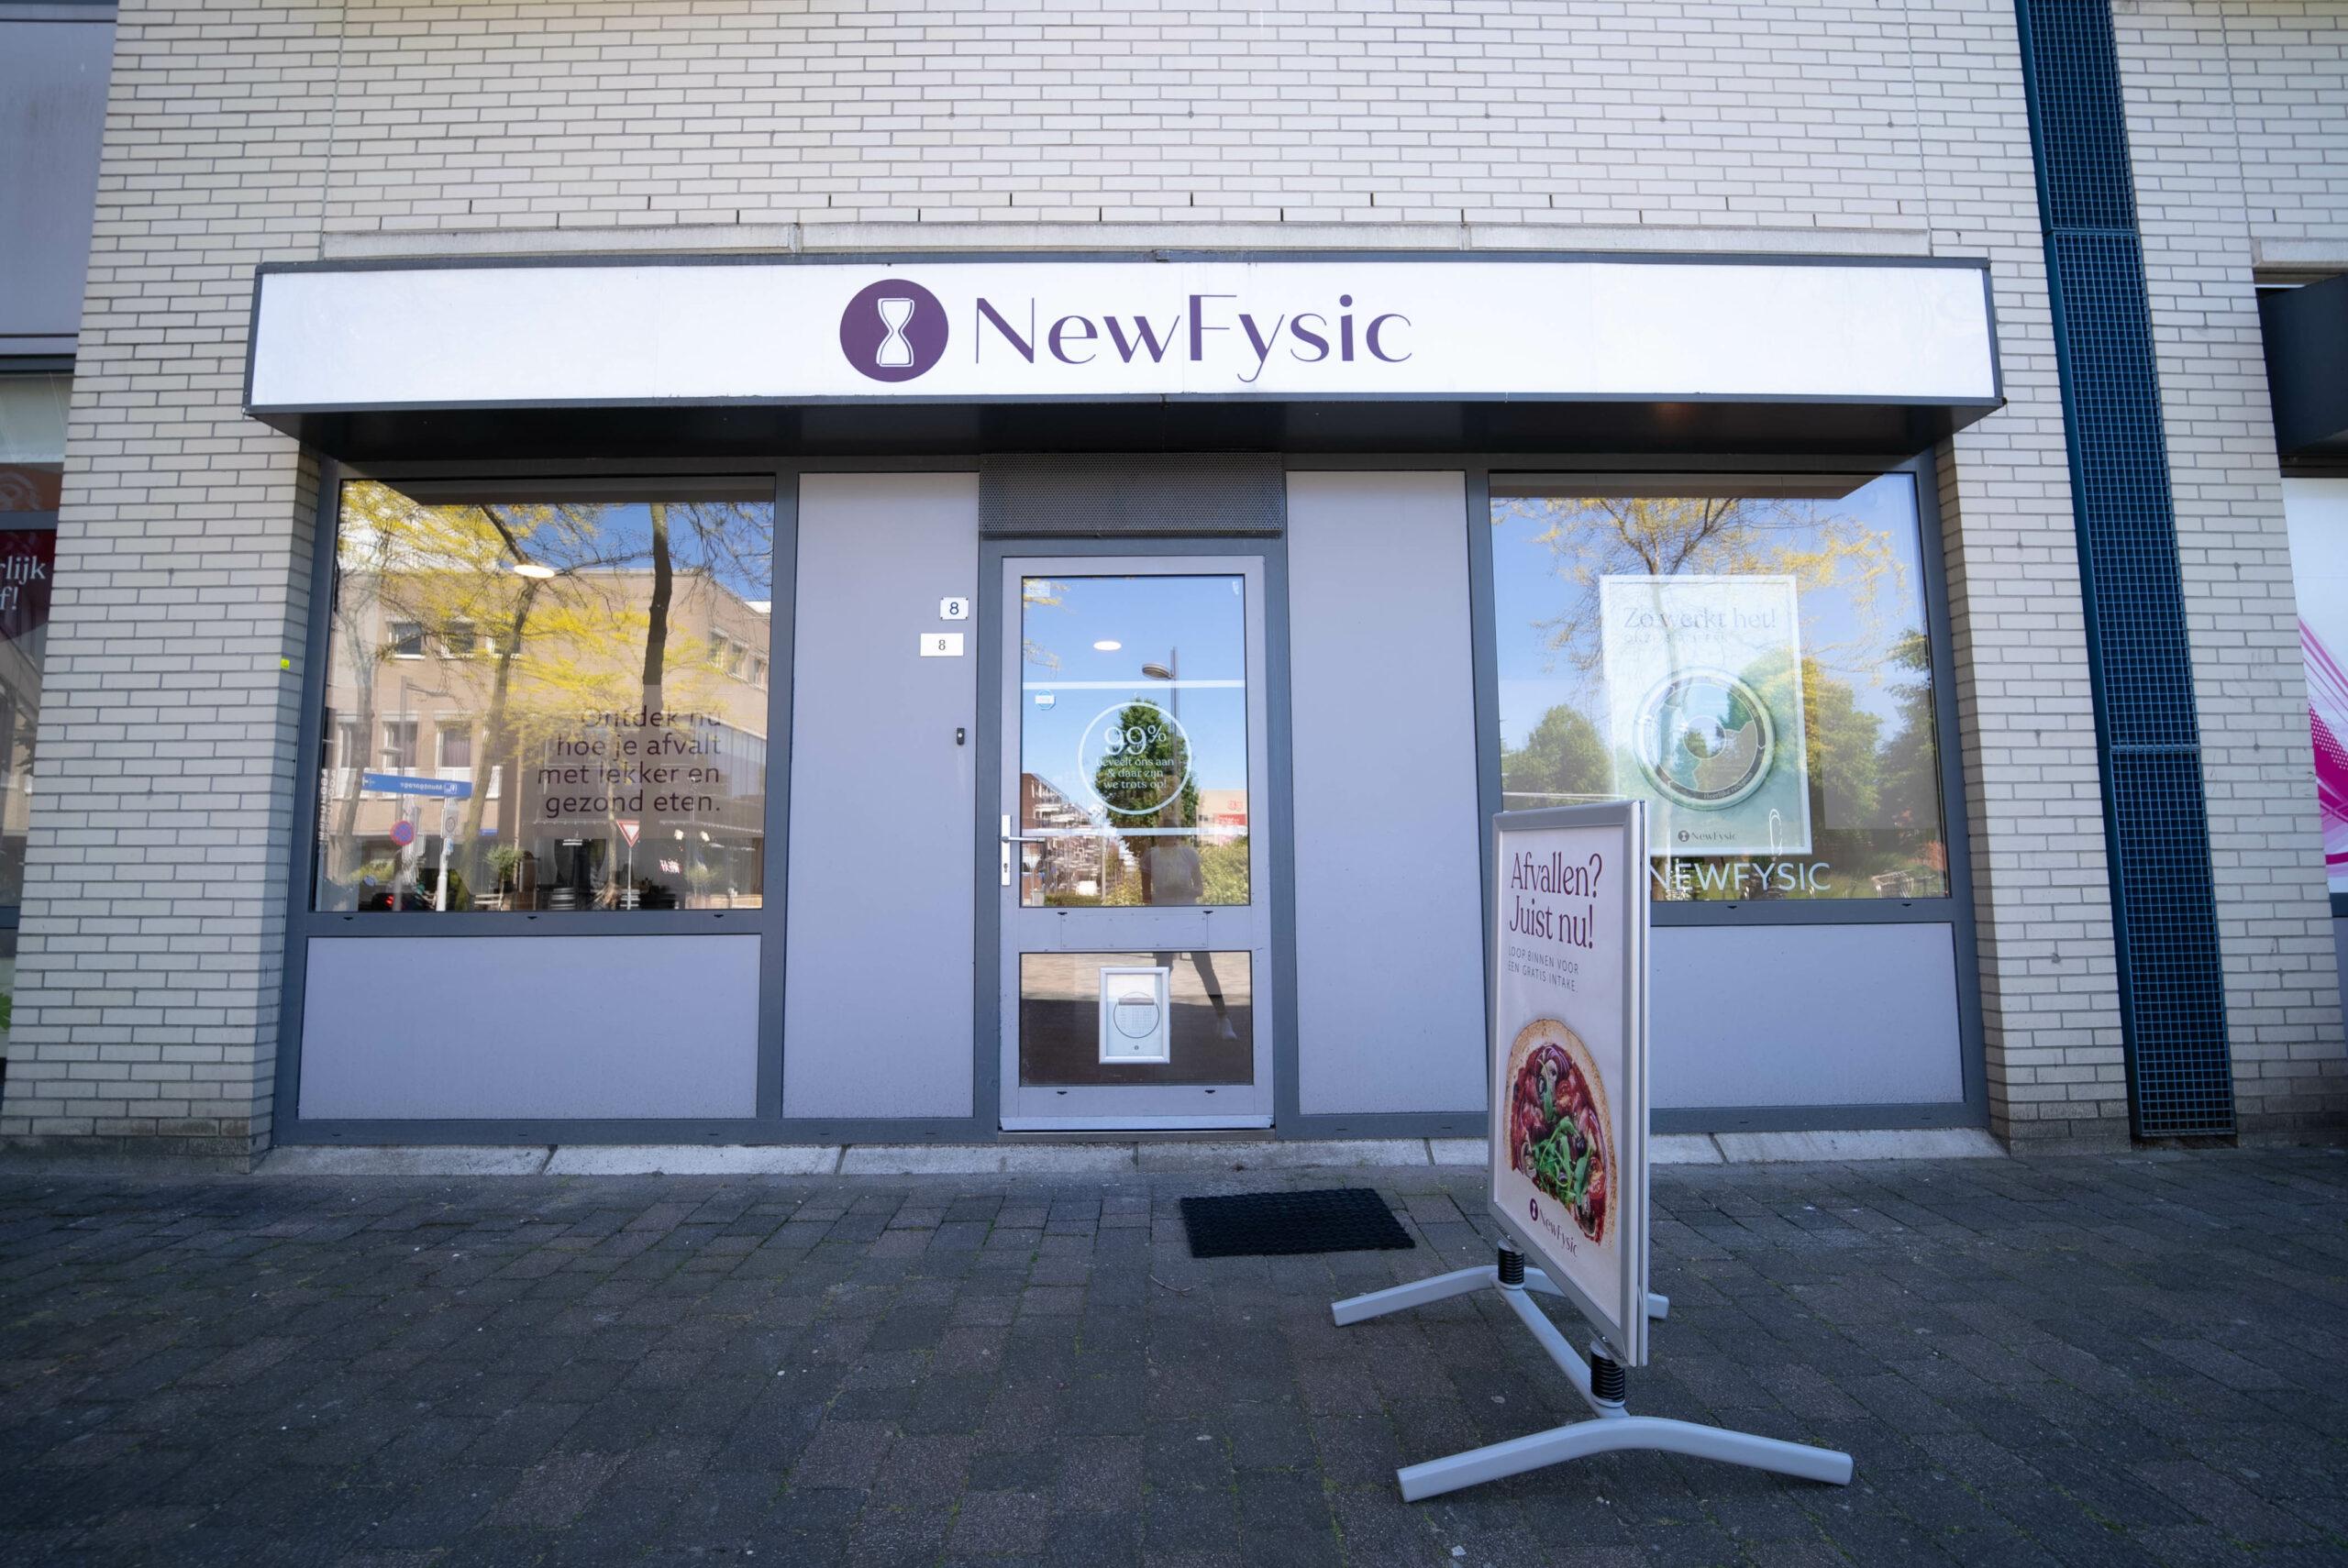 NewFysic Almere